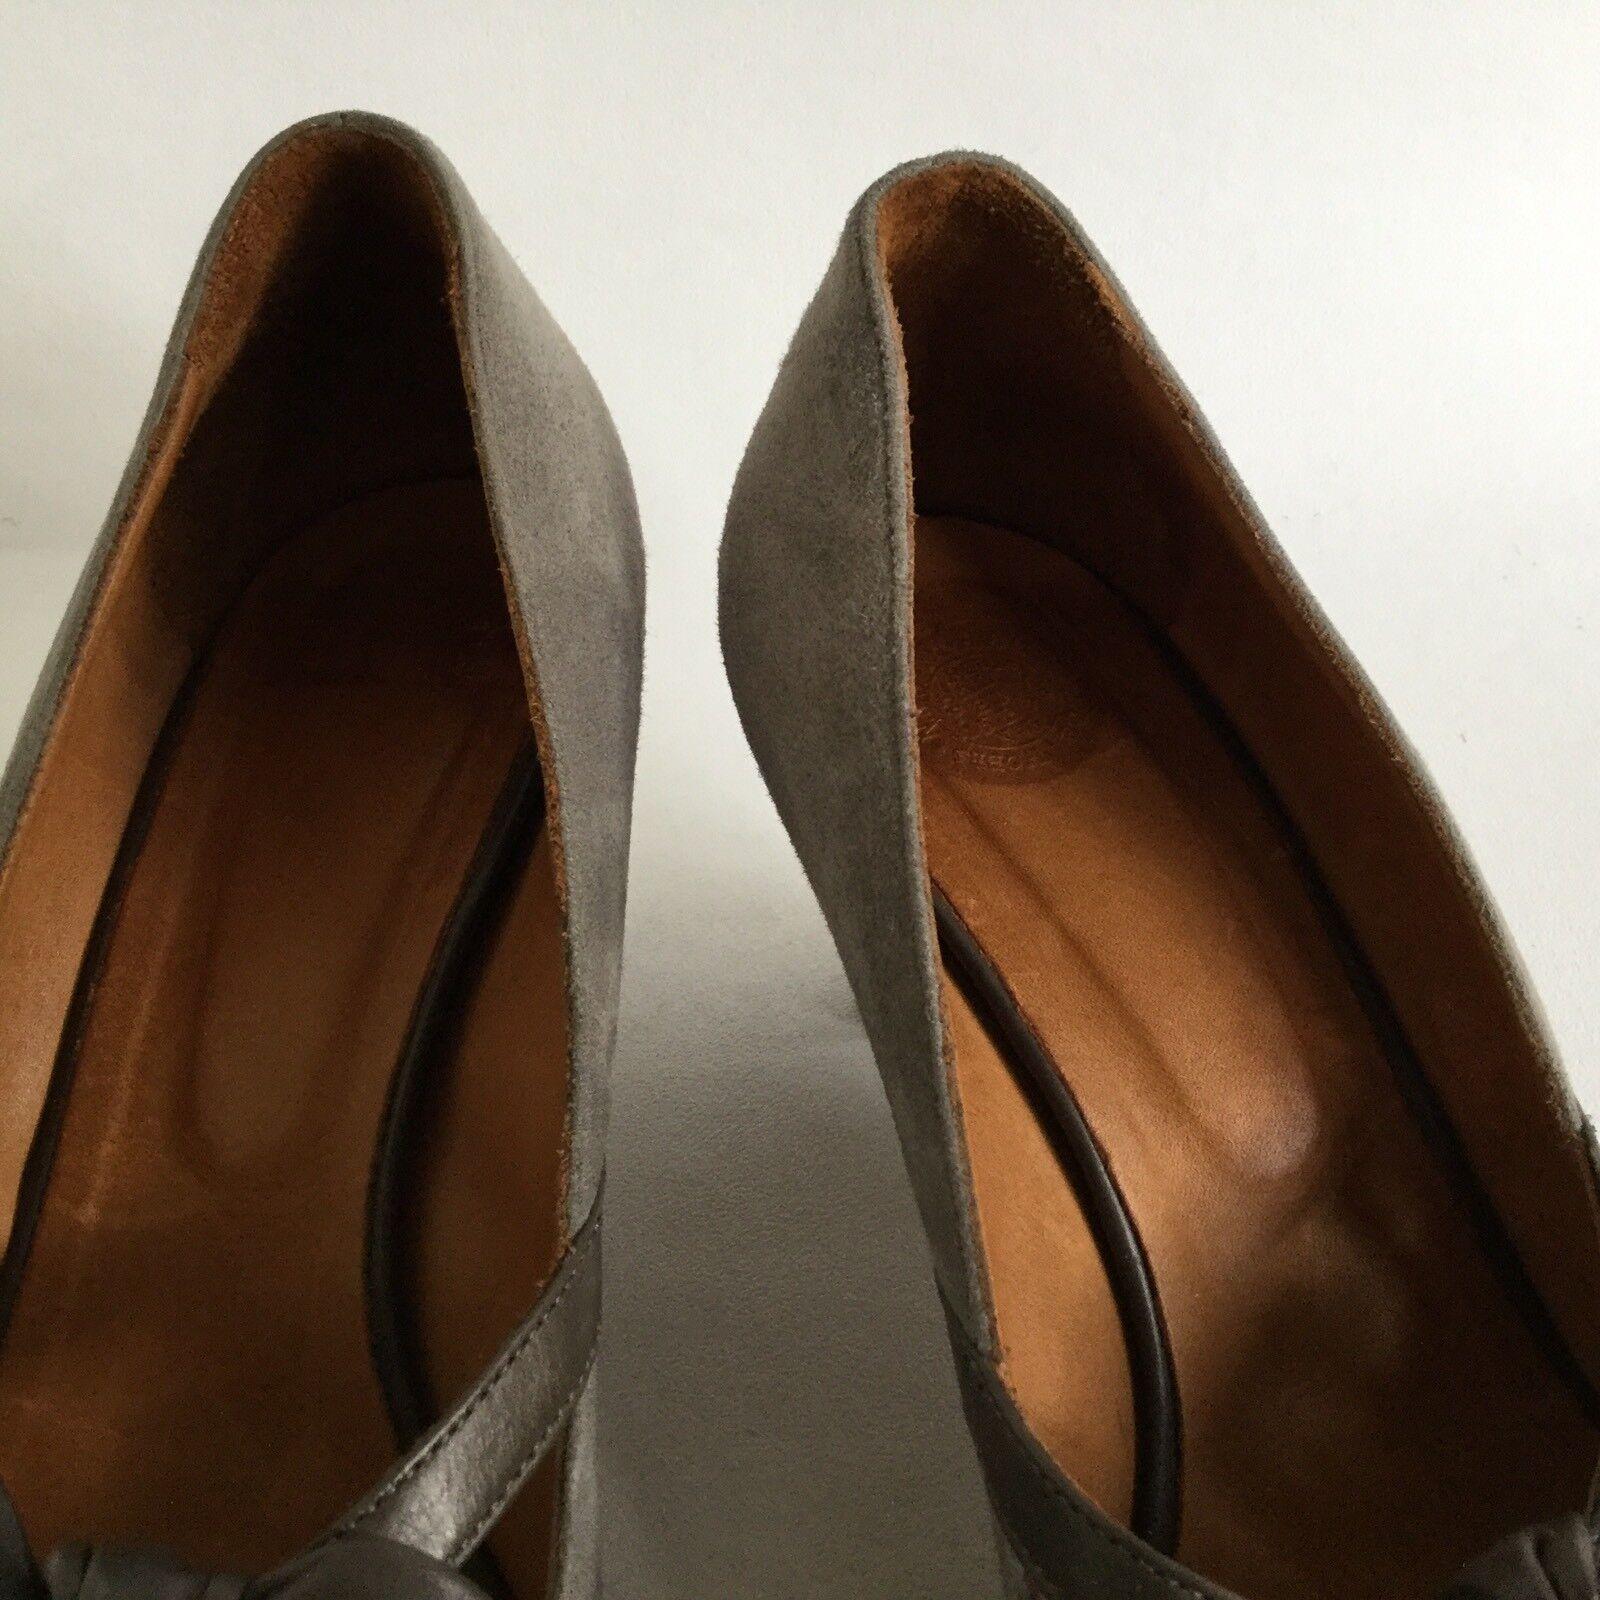 HOBBS NW3 Grau Suede Front Leder Peep Toe Bow Front Suede Court Schuhe Cone Heel UK 4 EU 37 cd36b5